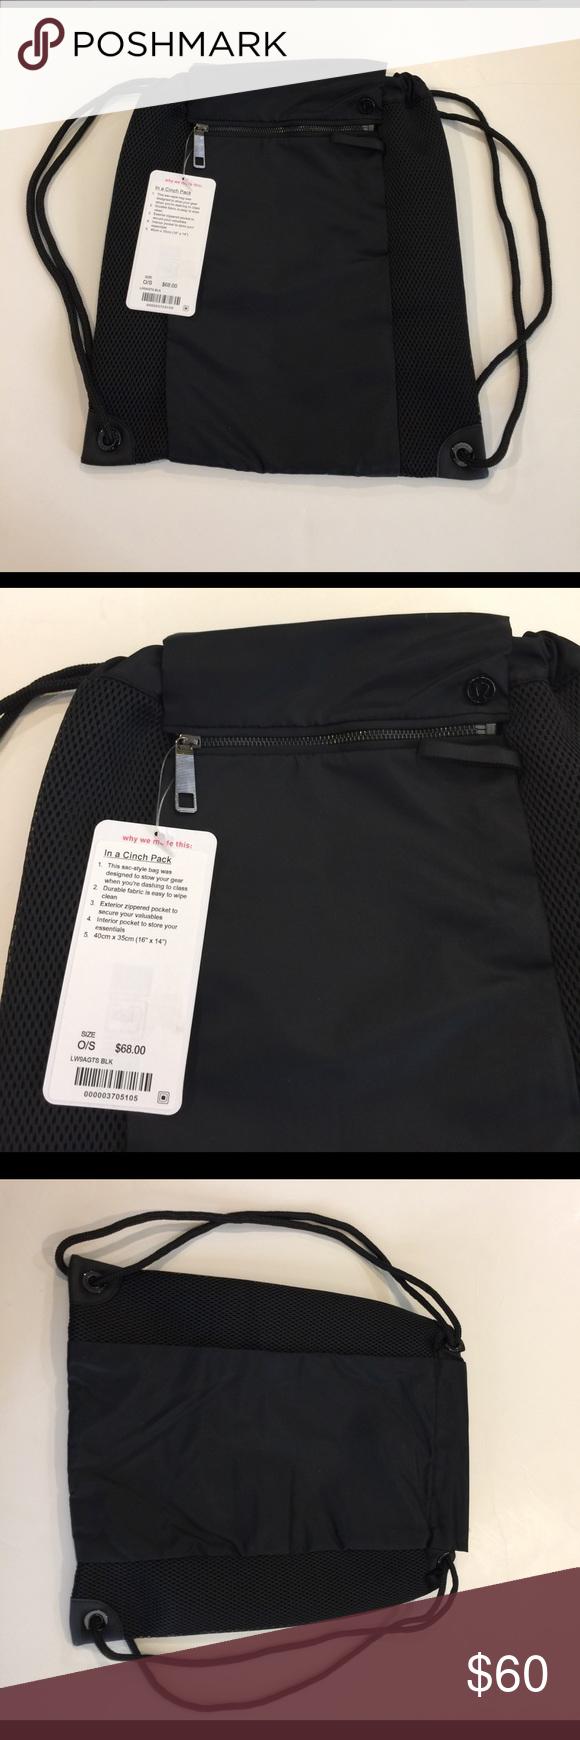 NWT In a Cinch Pack NWT lululemon athletica Bags Backpacks